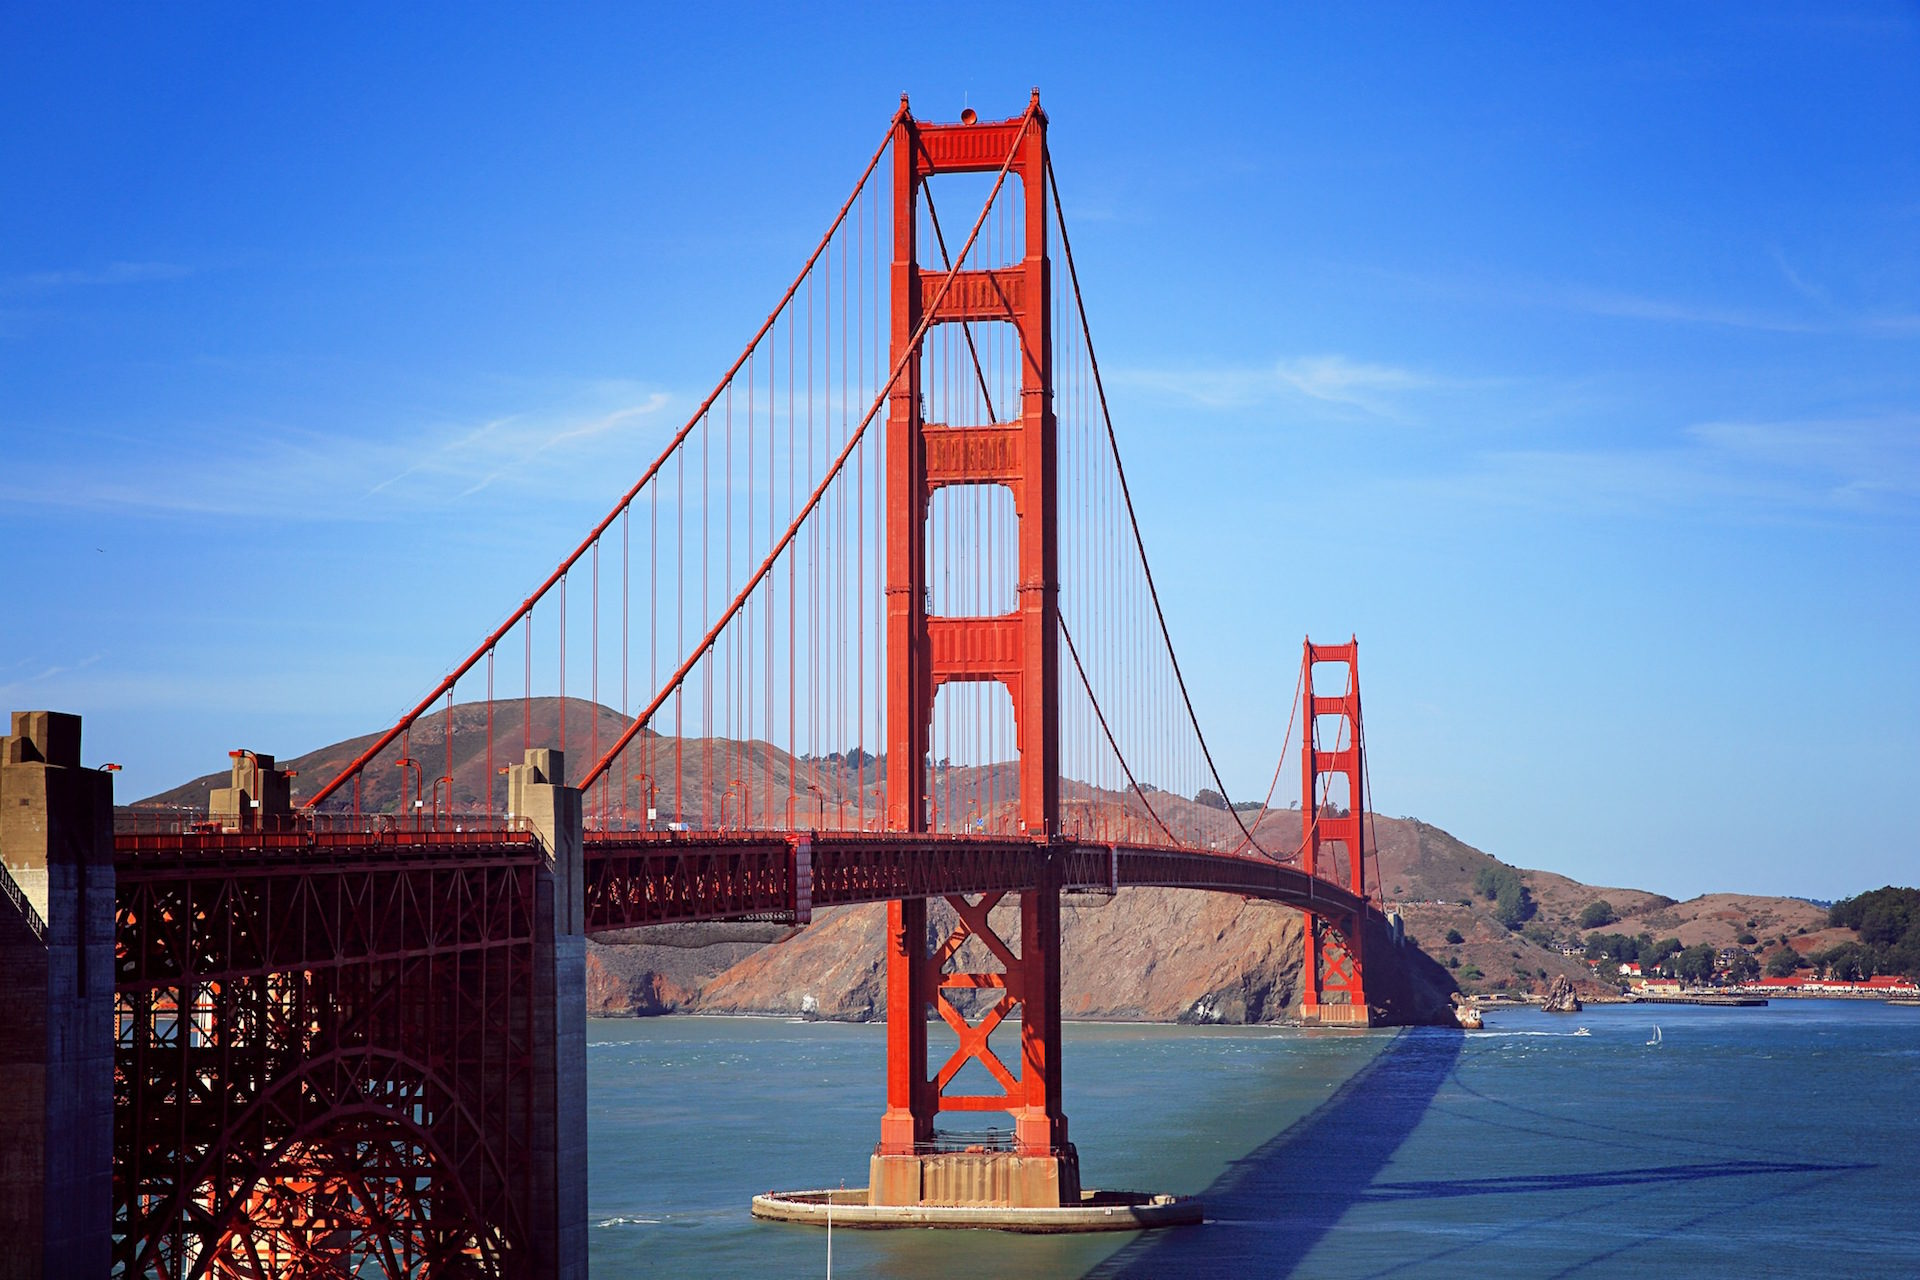 мост, Сан-Франциско, Небо, Монтаньяс, США - Обои HD - Профессор falken.com